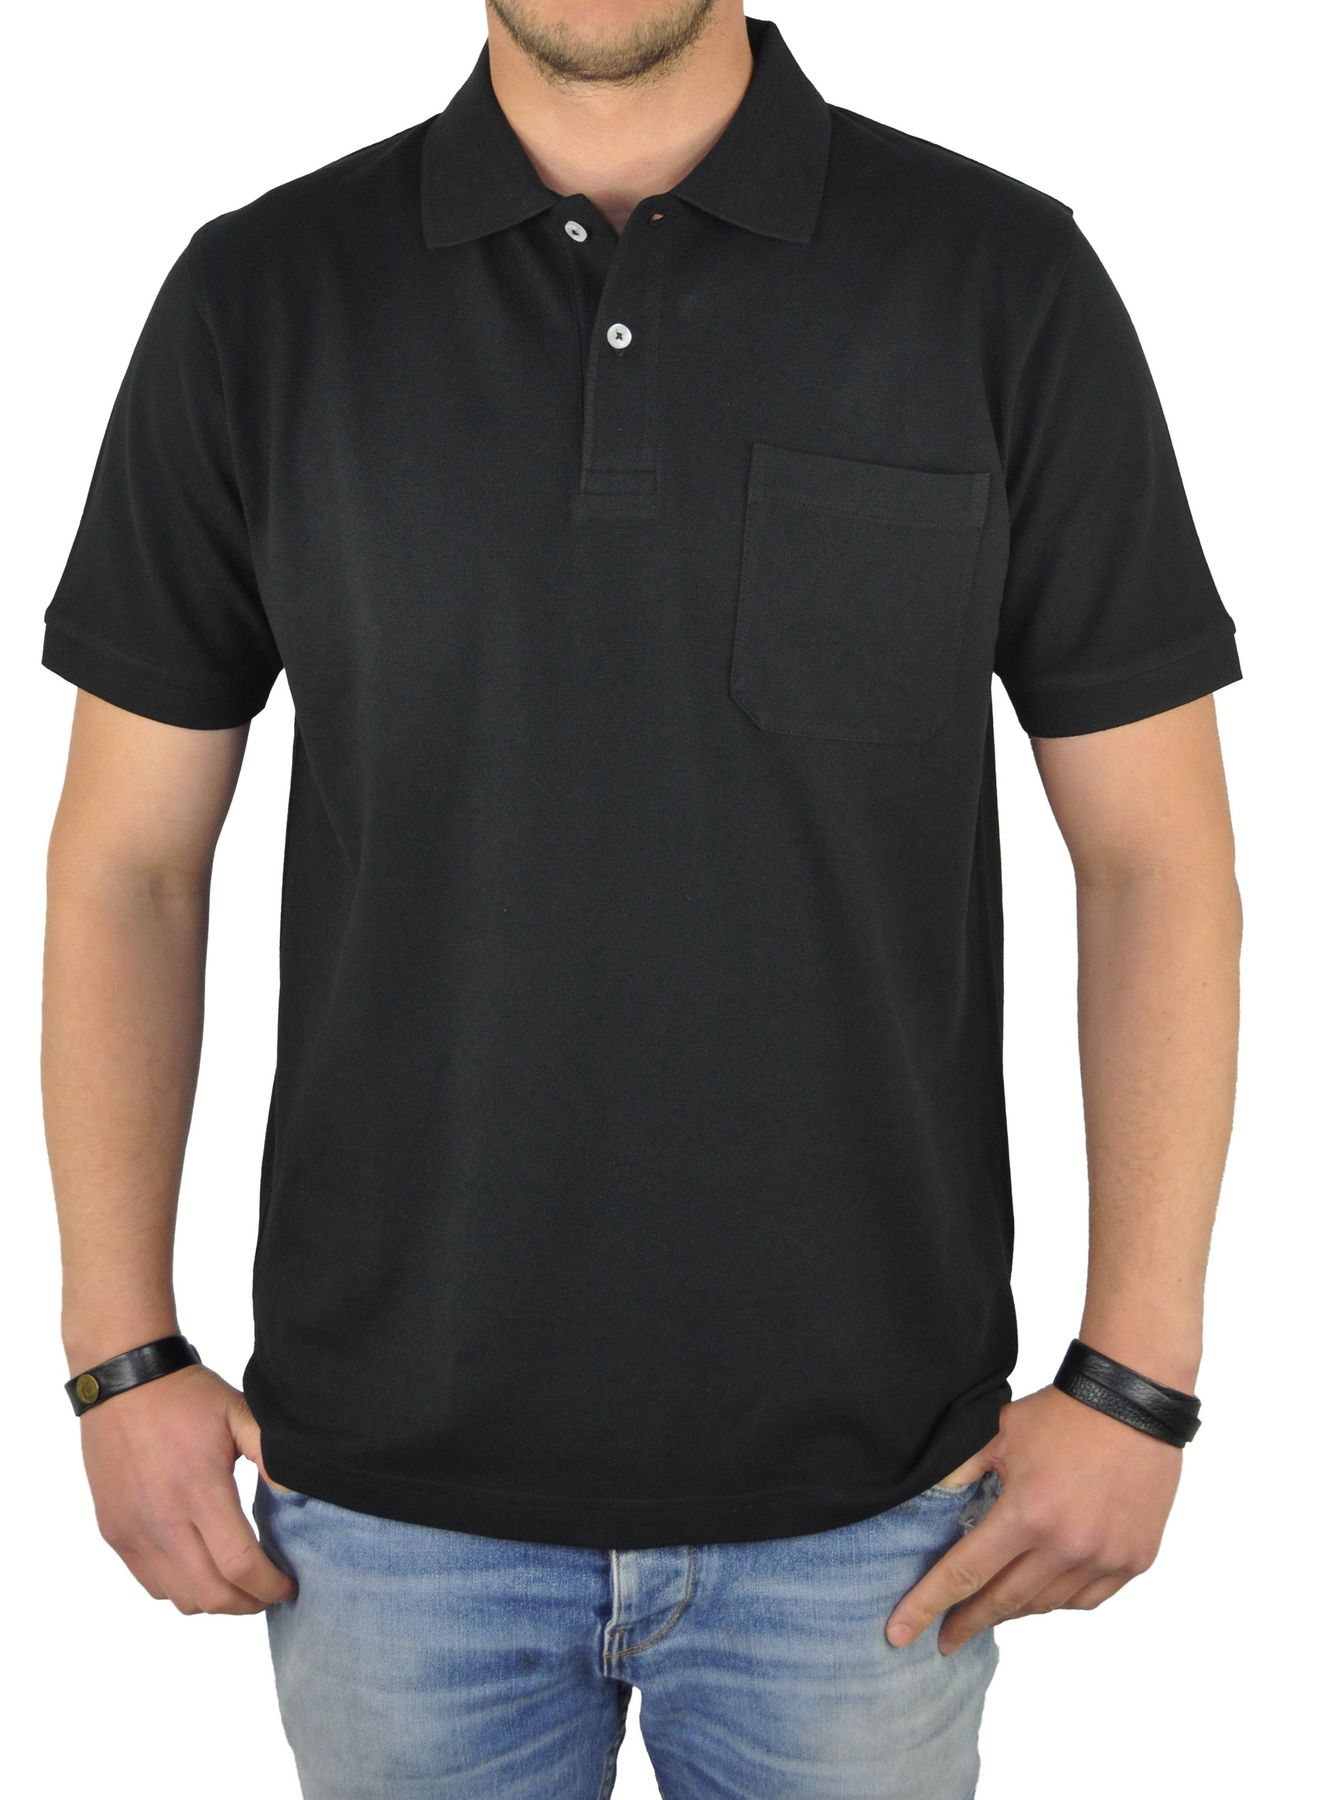 KITARO - Herren Poloshirt in verschiedenen Farben (68800) – Bild 1